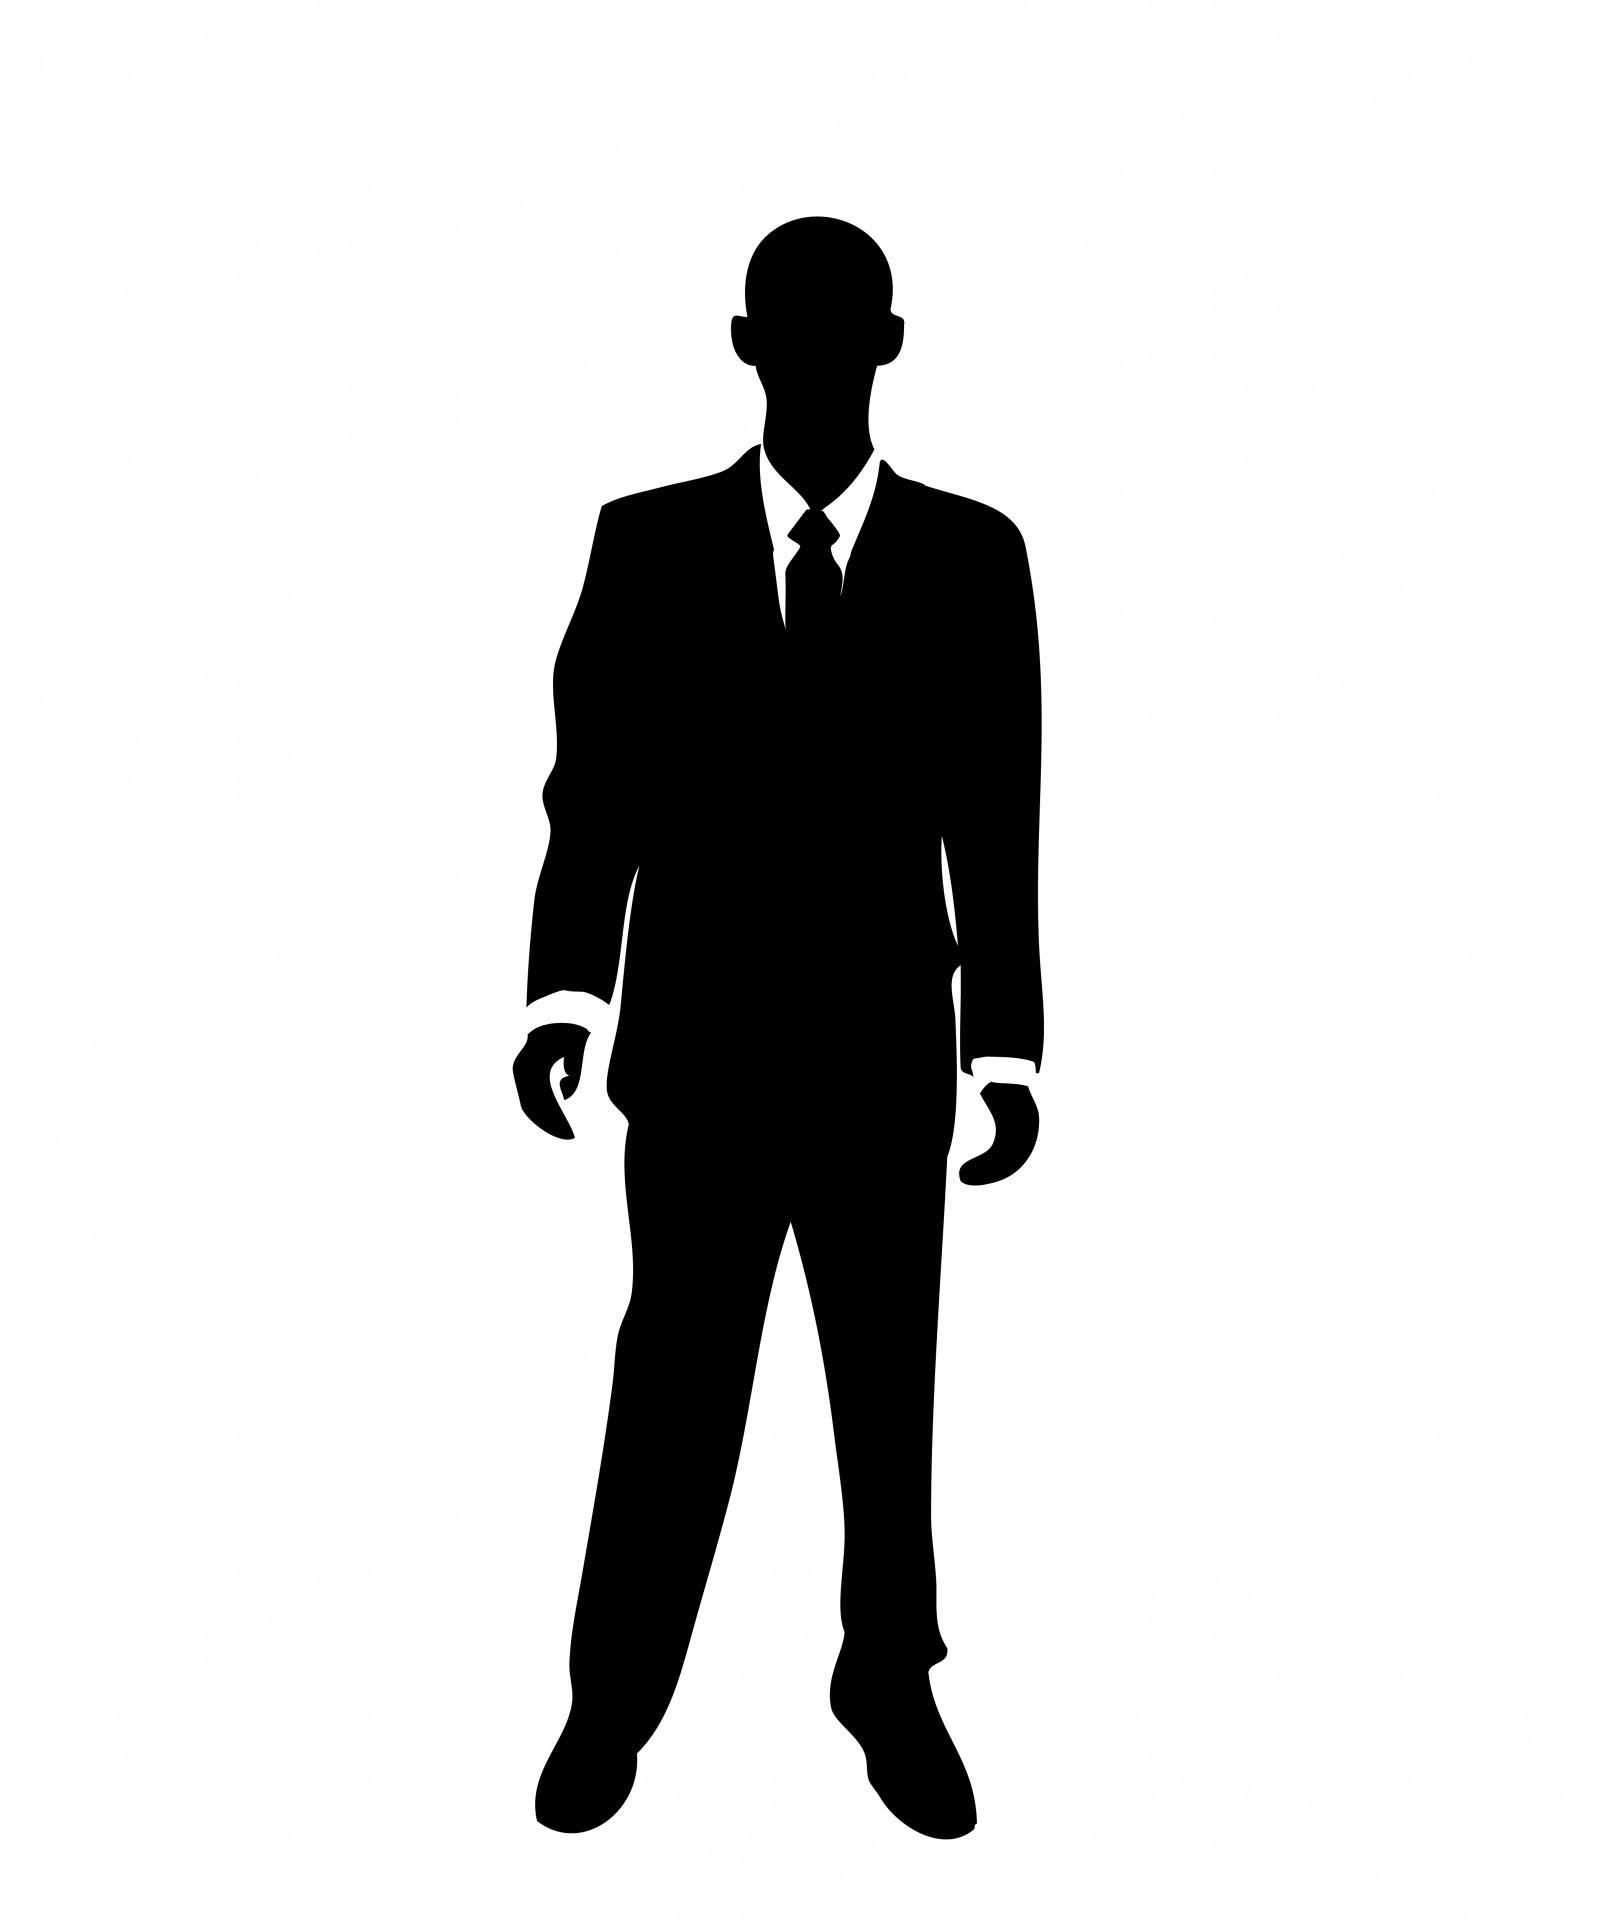 standing businessman silhouette cartoon royalty free - HD1605×1920